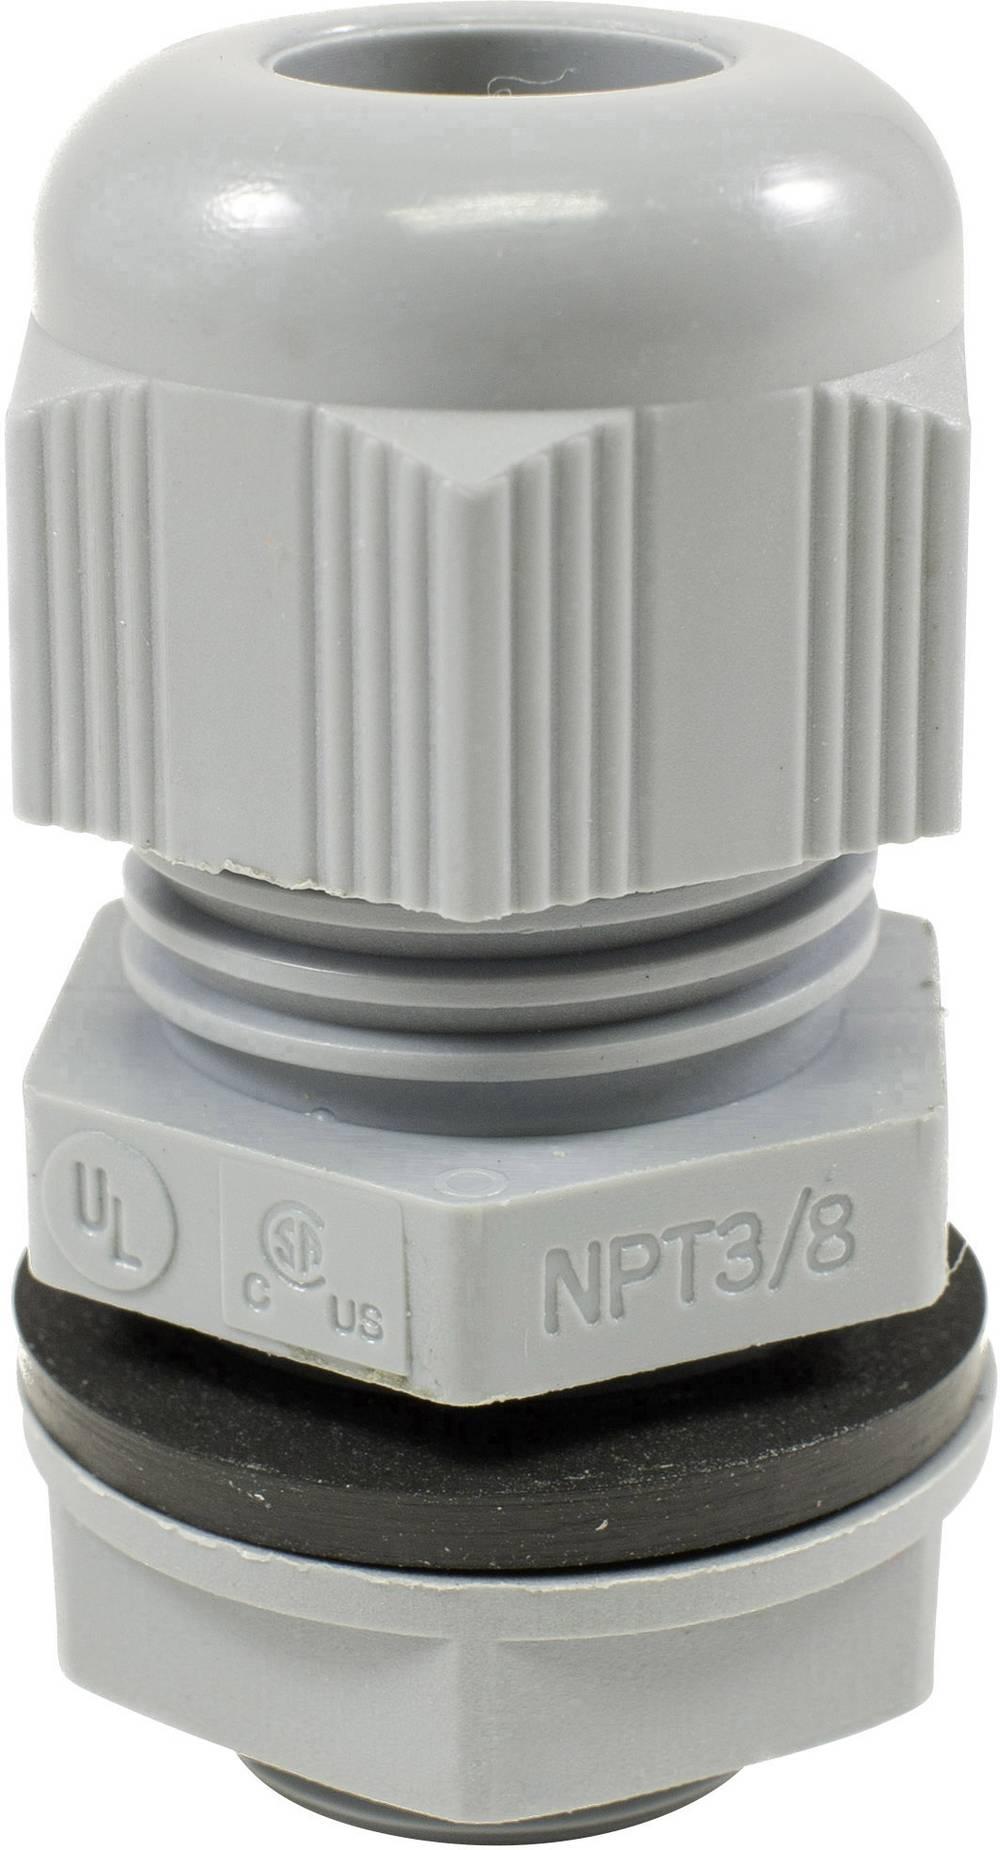 Kabelförskruvning AlphaWire PMC12 SL080 Polyamid Skiffergrå 1 st